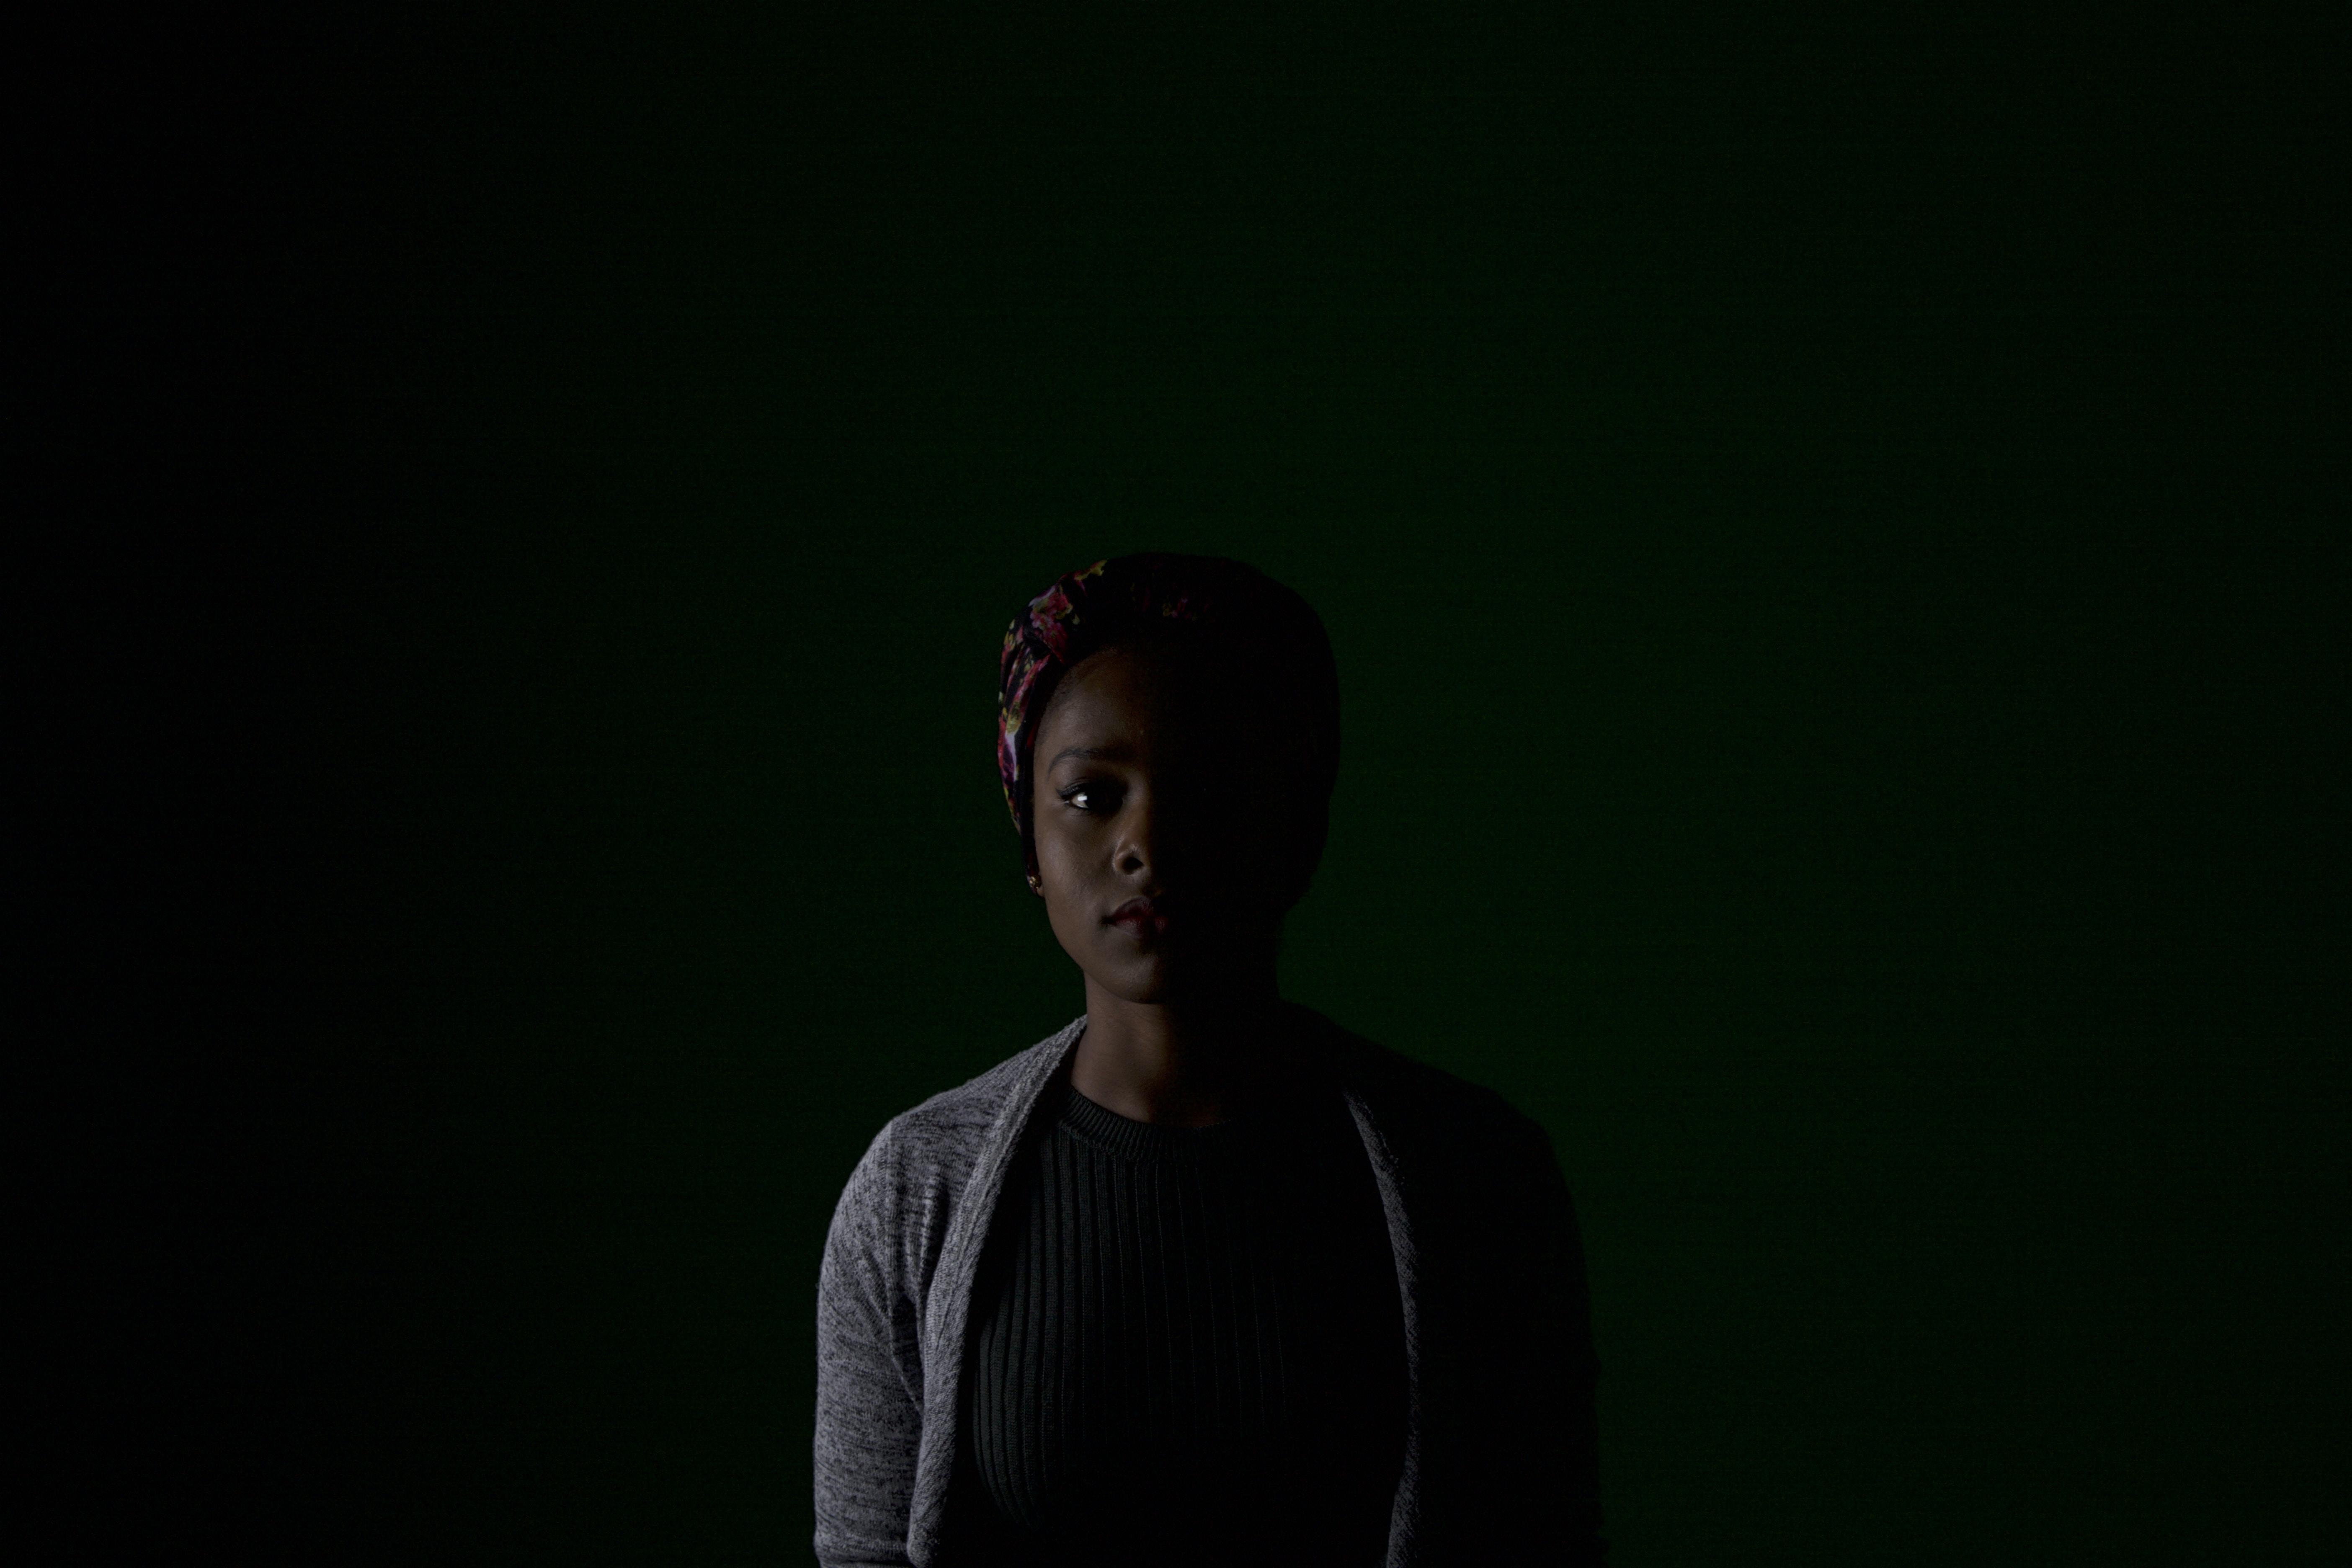 woman indoor photography